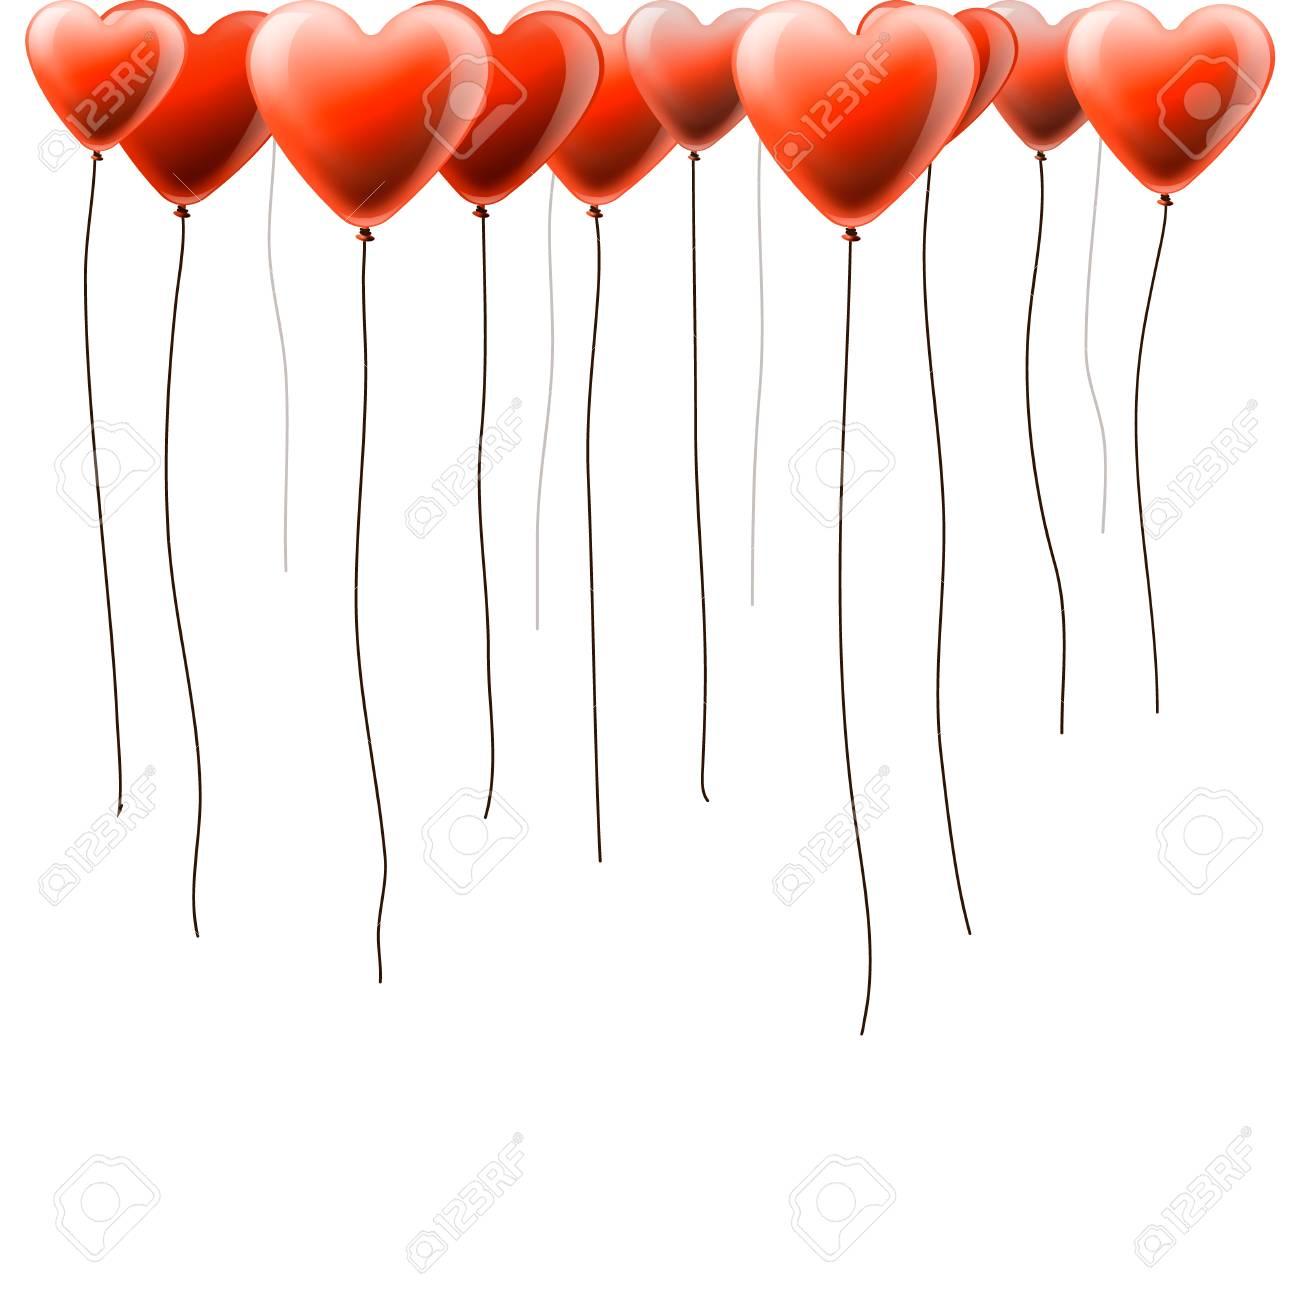 Heart shape balloons, vector Eps10 illustration Stock Vector - 17448681